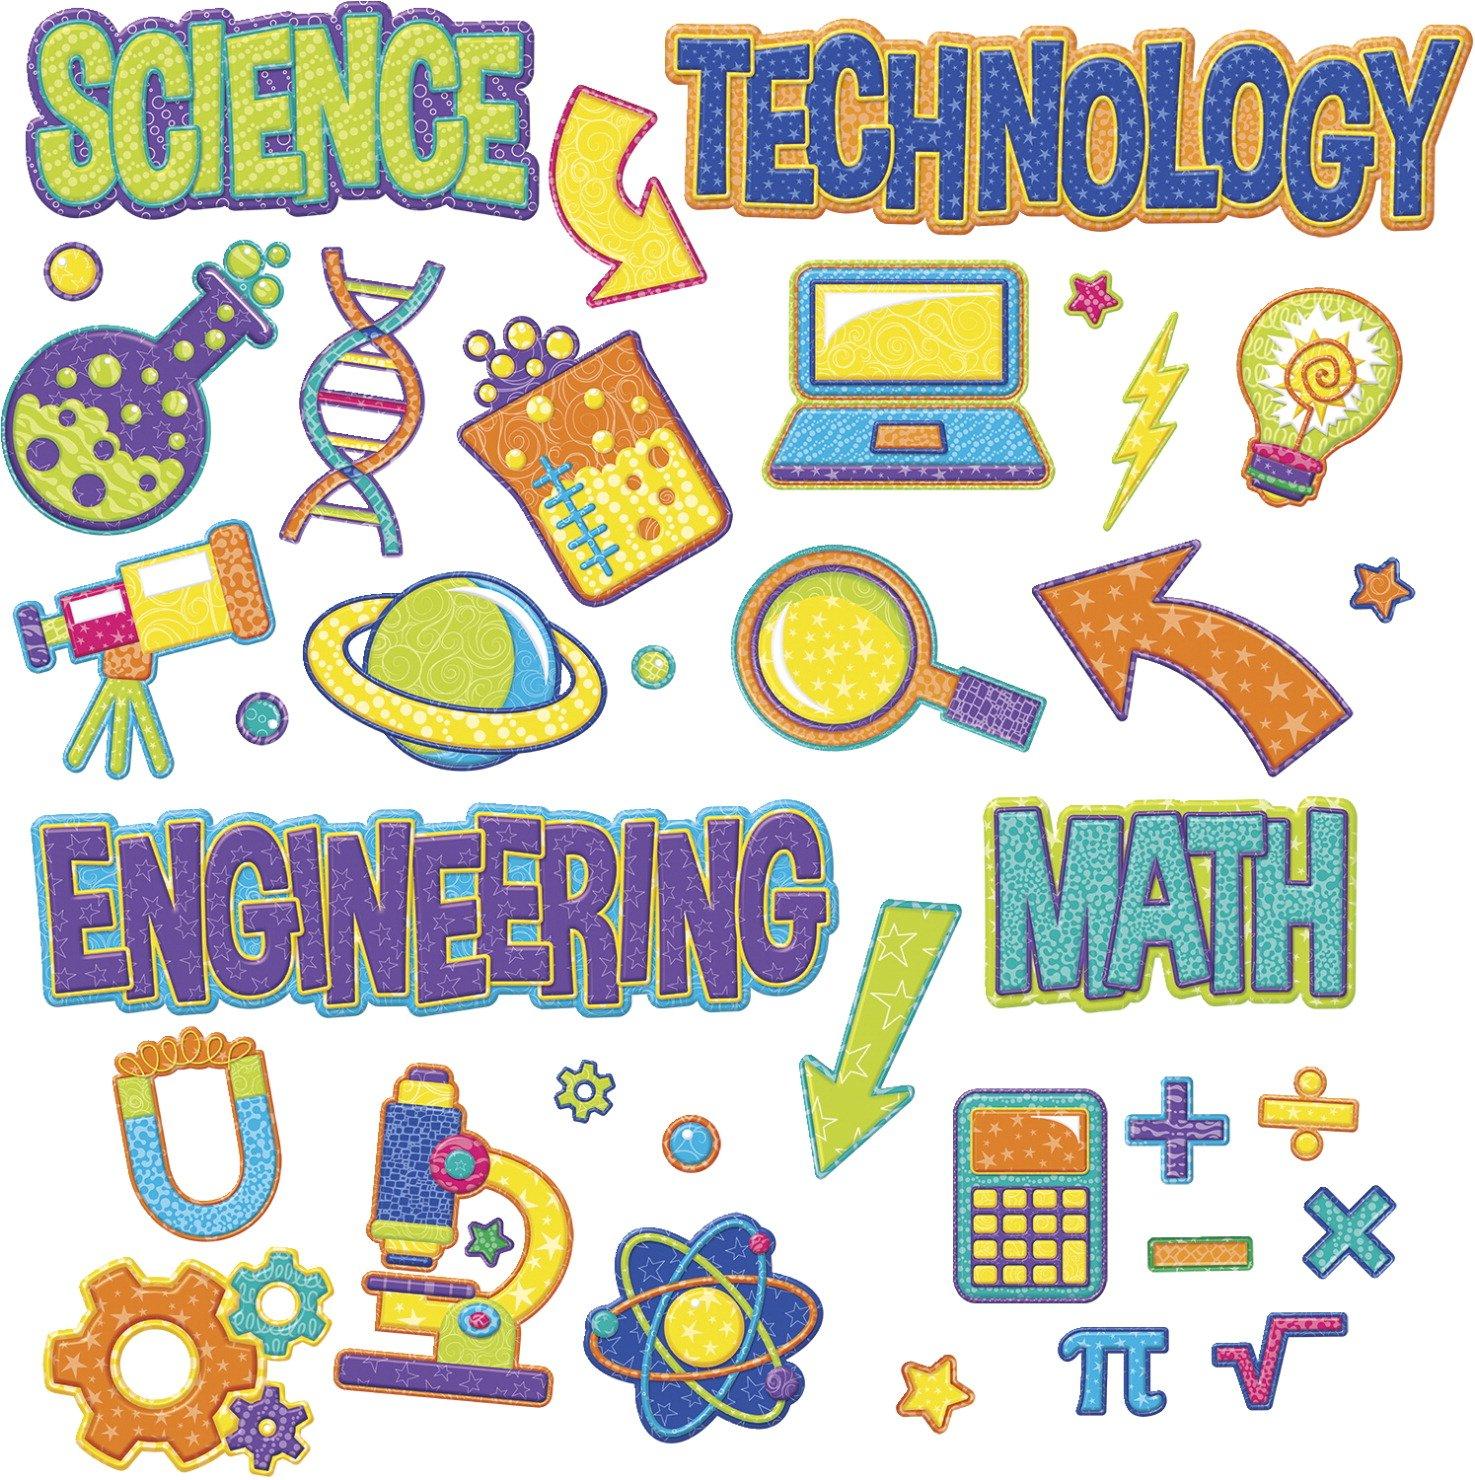 Eureka Color My World Teacher Supplies STEM Bulletin Board Set, 36 pcs Paper Magic Group 847775